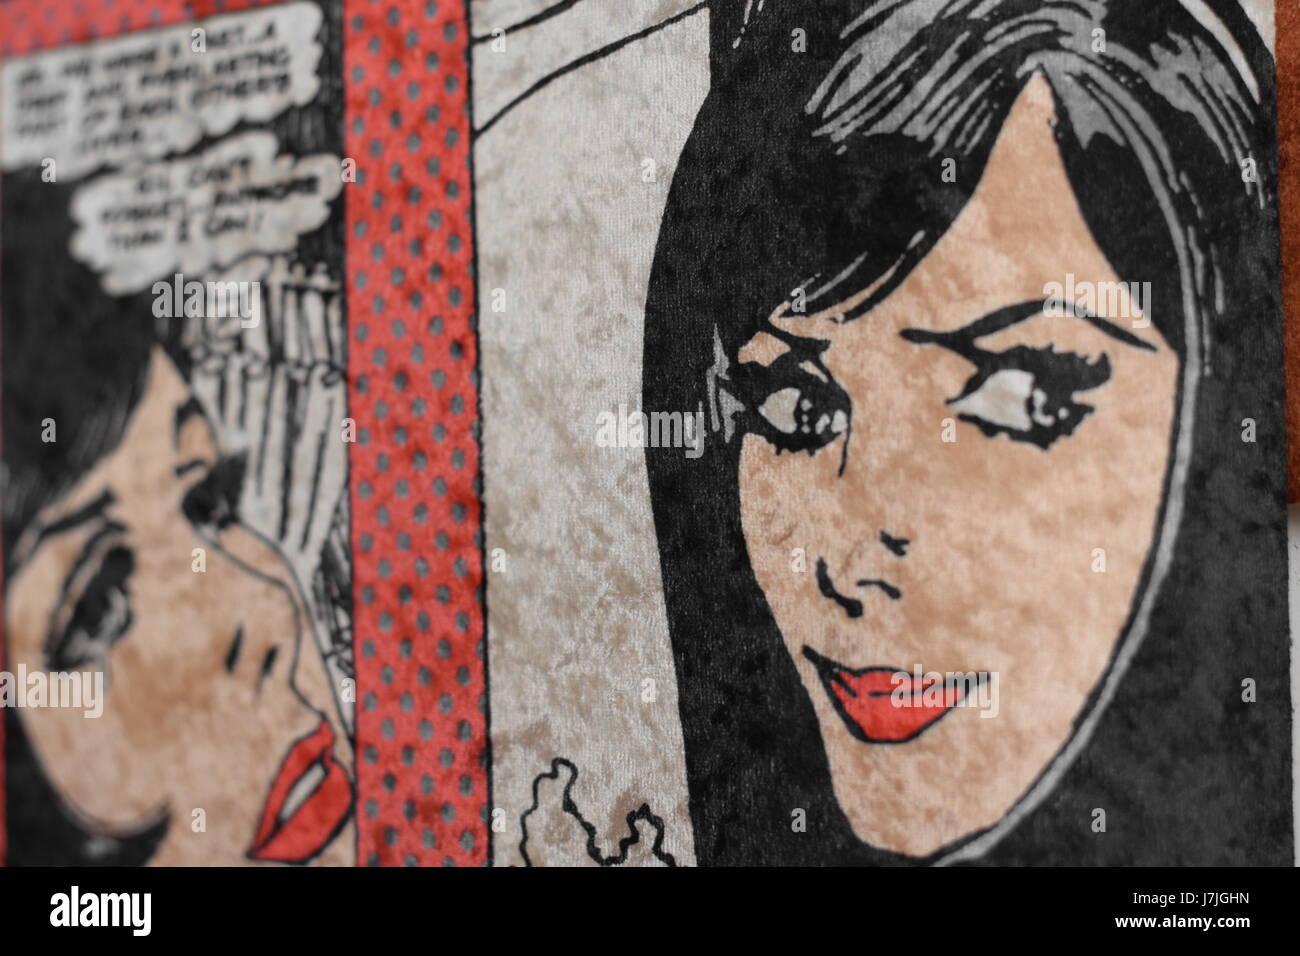 Eine abstrakte Mädchen an Wand malen. Stockbild